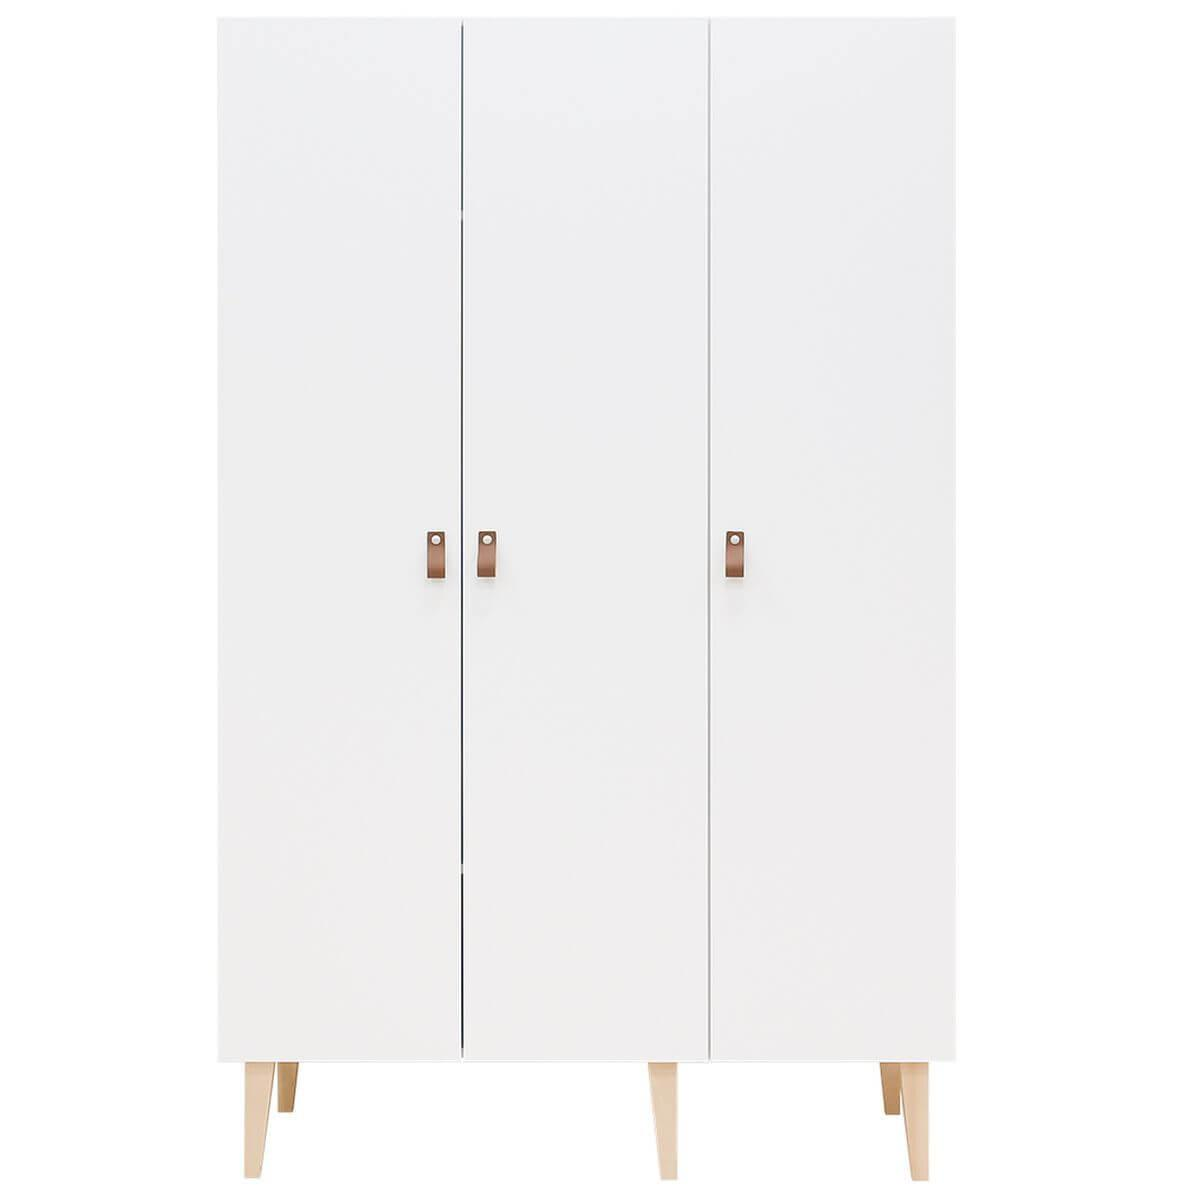 Armario 3 puertas INDY Bopita blanco-natural